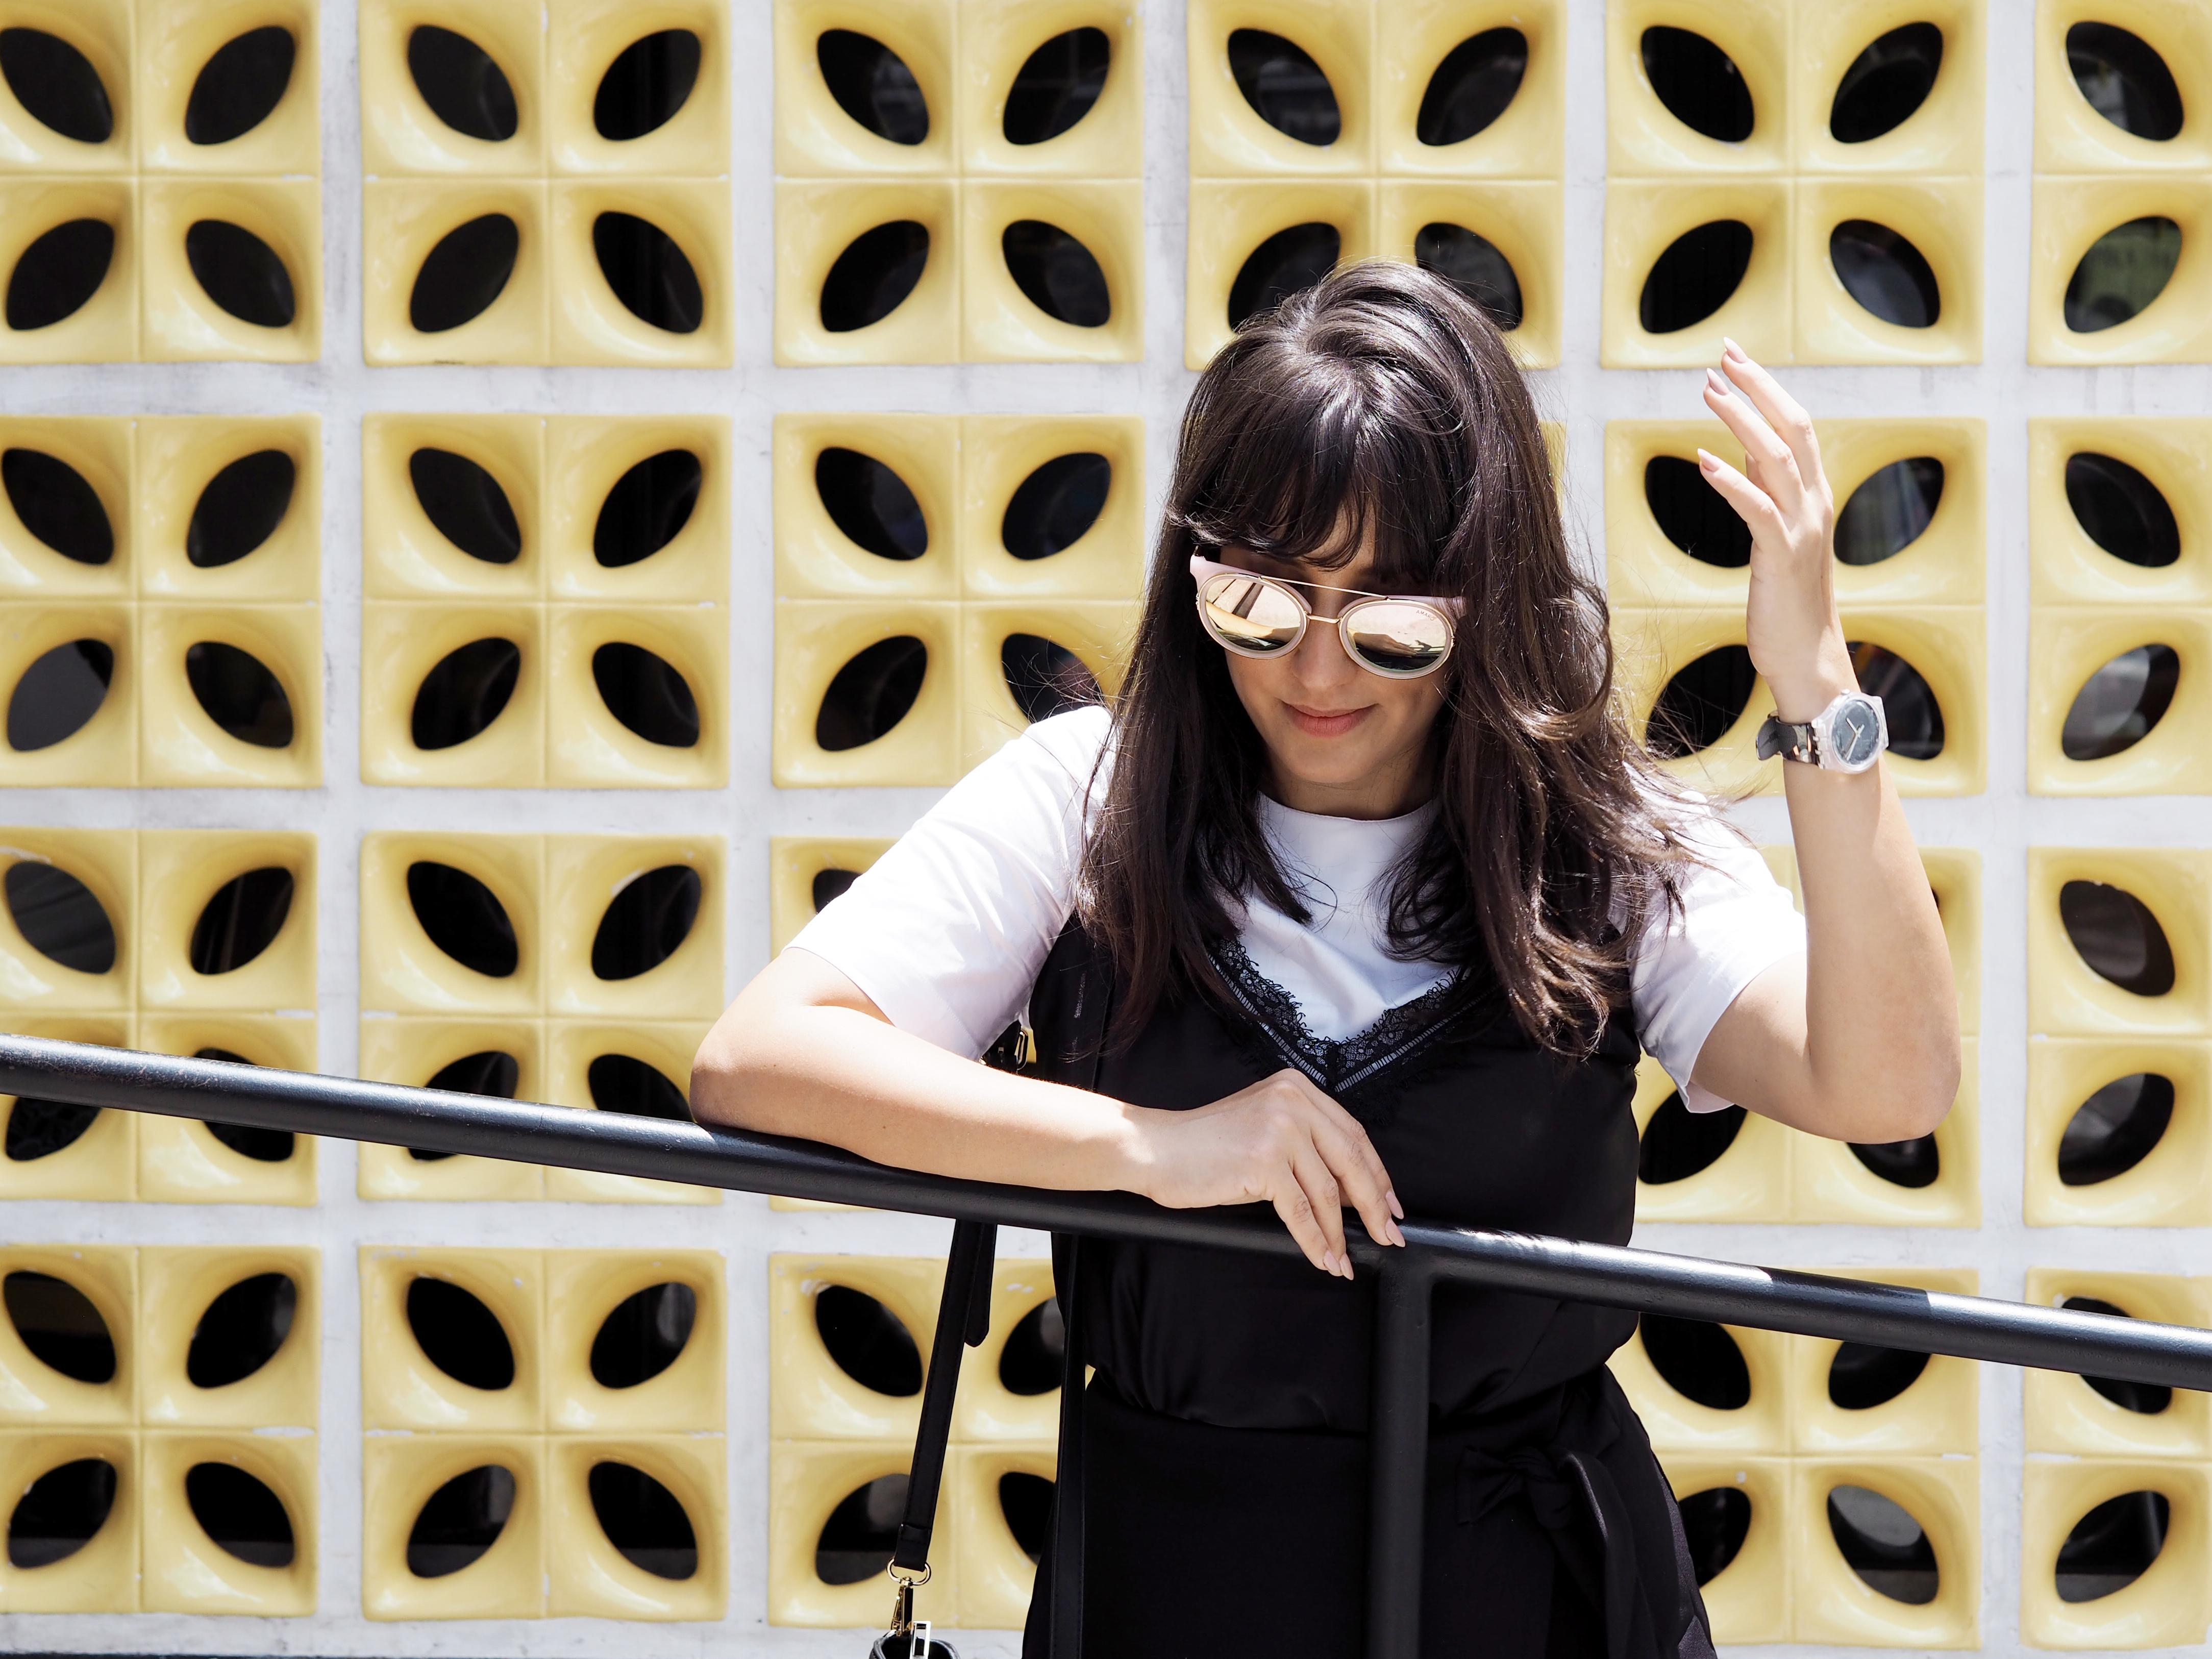 fc28ee721 camiseta branca   regata preta renda   saia (ADOREI o caimento!) bolsa    tênis   óculos